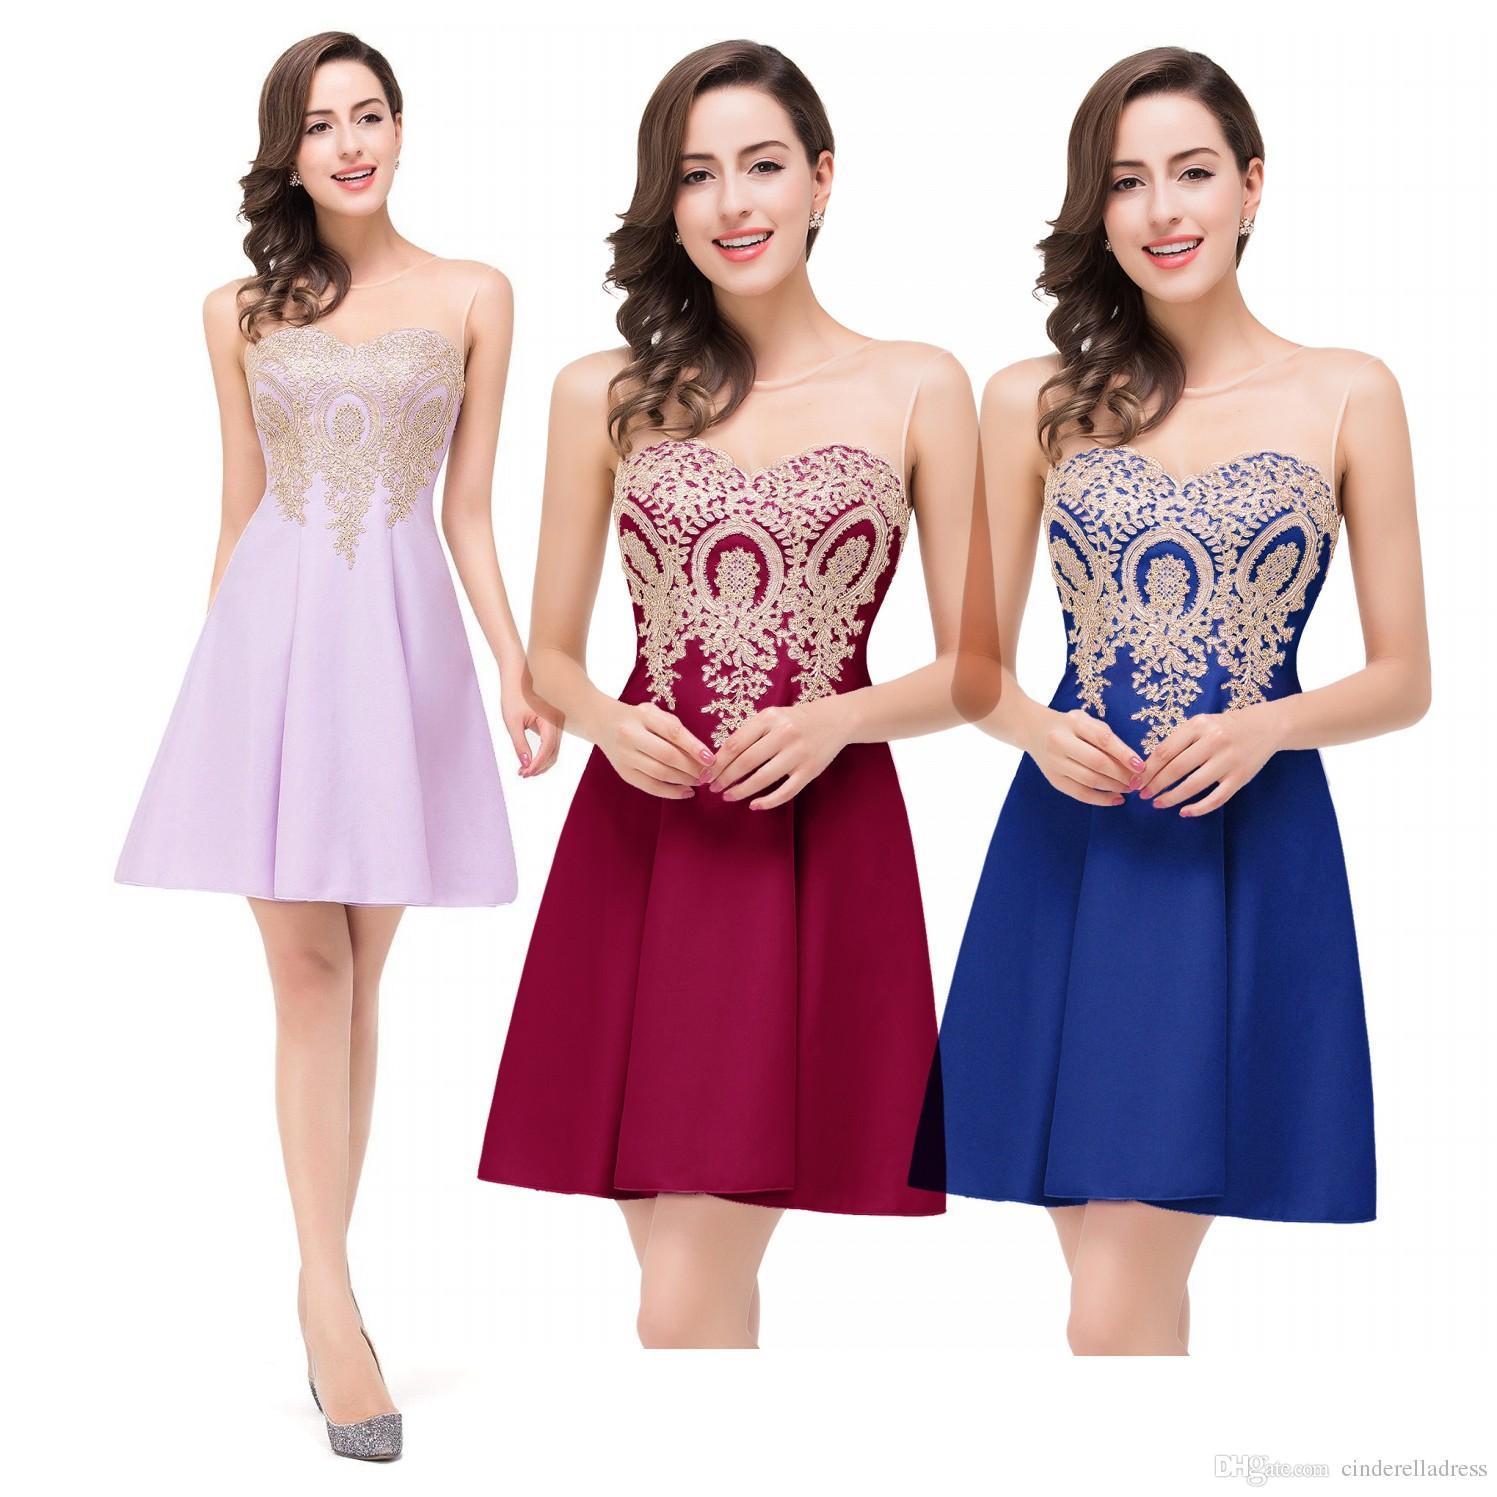 Under 50 lace summer beach bridesmaid dresses new cheap plus size cheap pregnant bridesmaid dresses line discount sparkly purple bridesmaid dresses ombrellifo Gallery